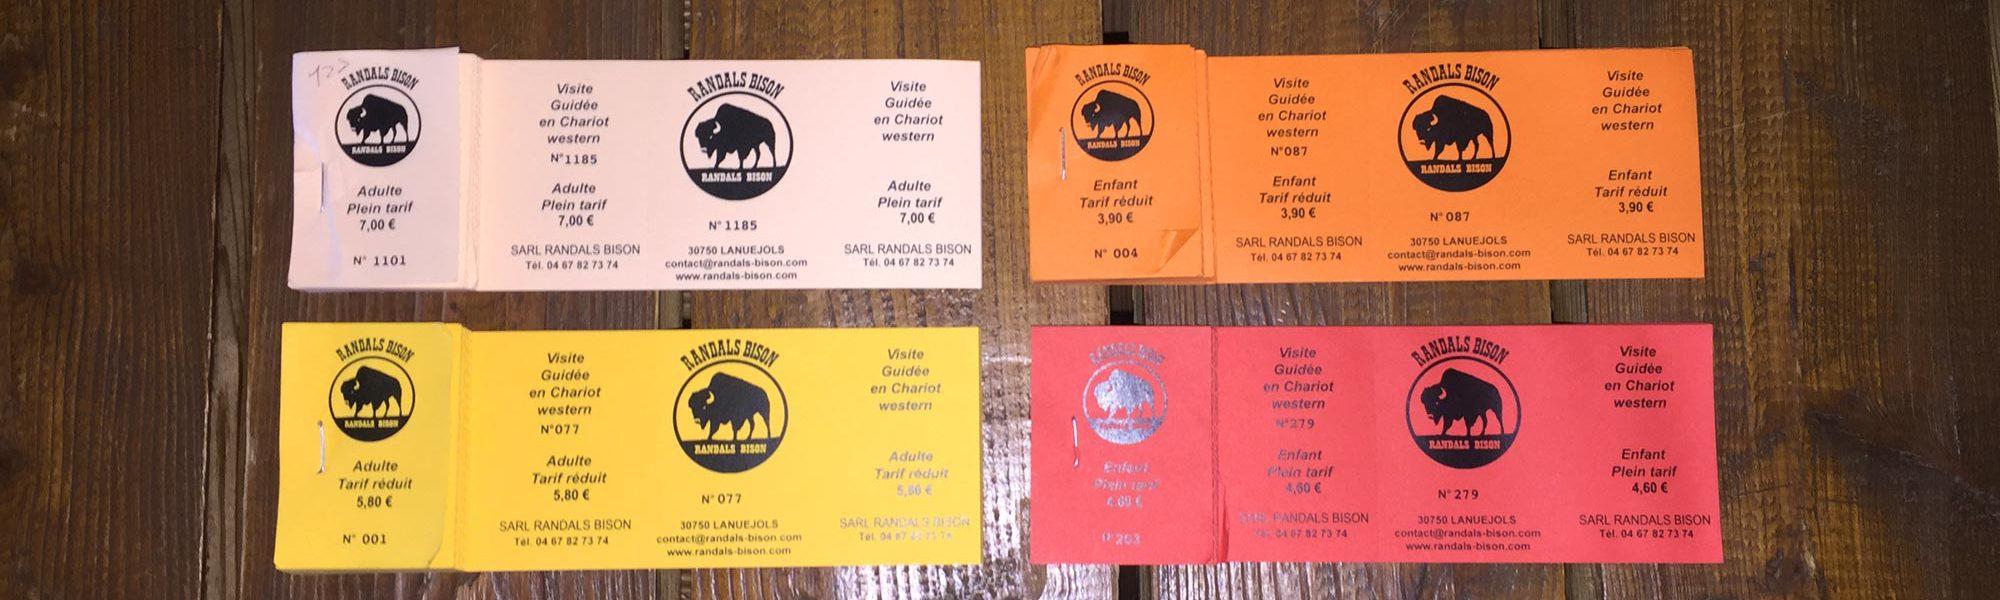 s-tarifs-tickets